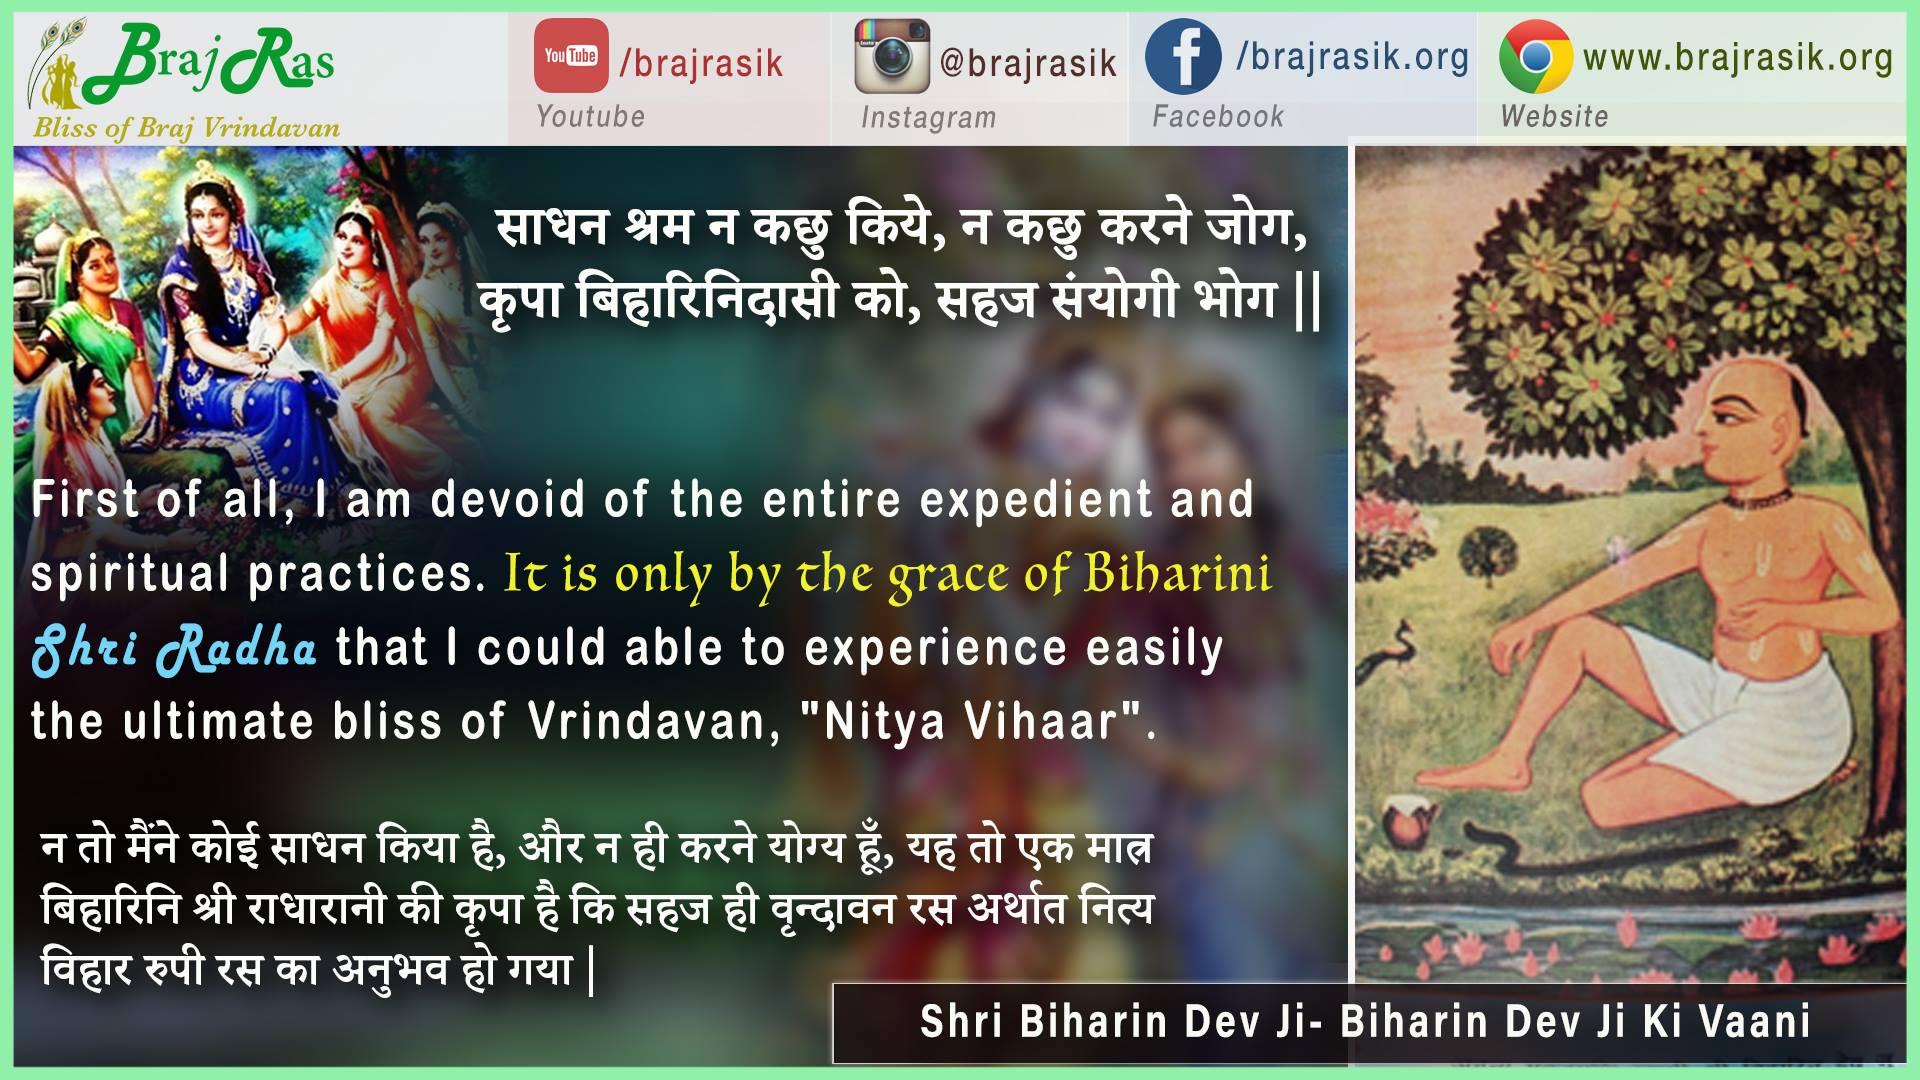 Sadhan Shram Na Kachu Kiye - Shri Biharin Dev Ji- Biharin Dev Ji Ki Vaani